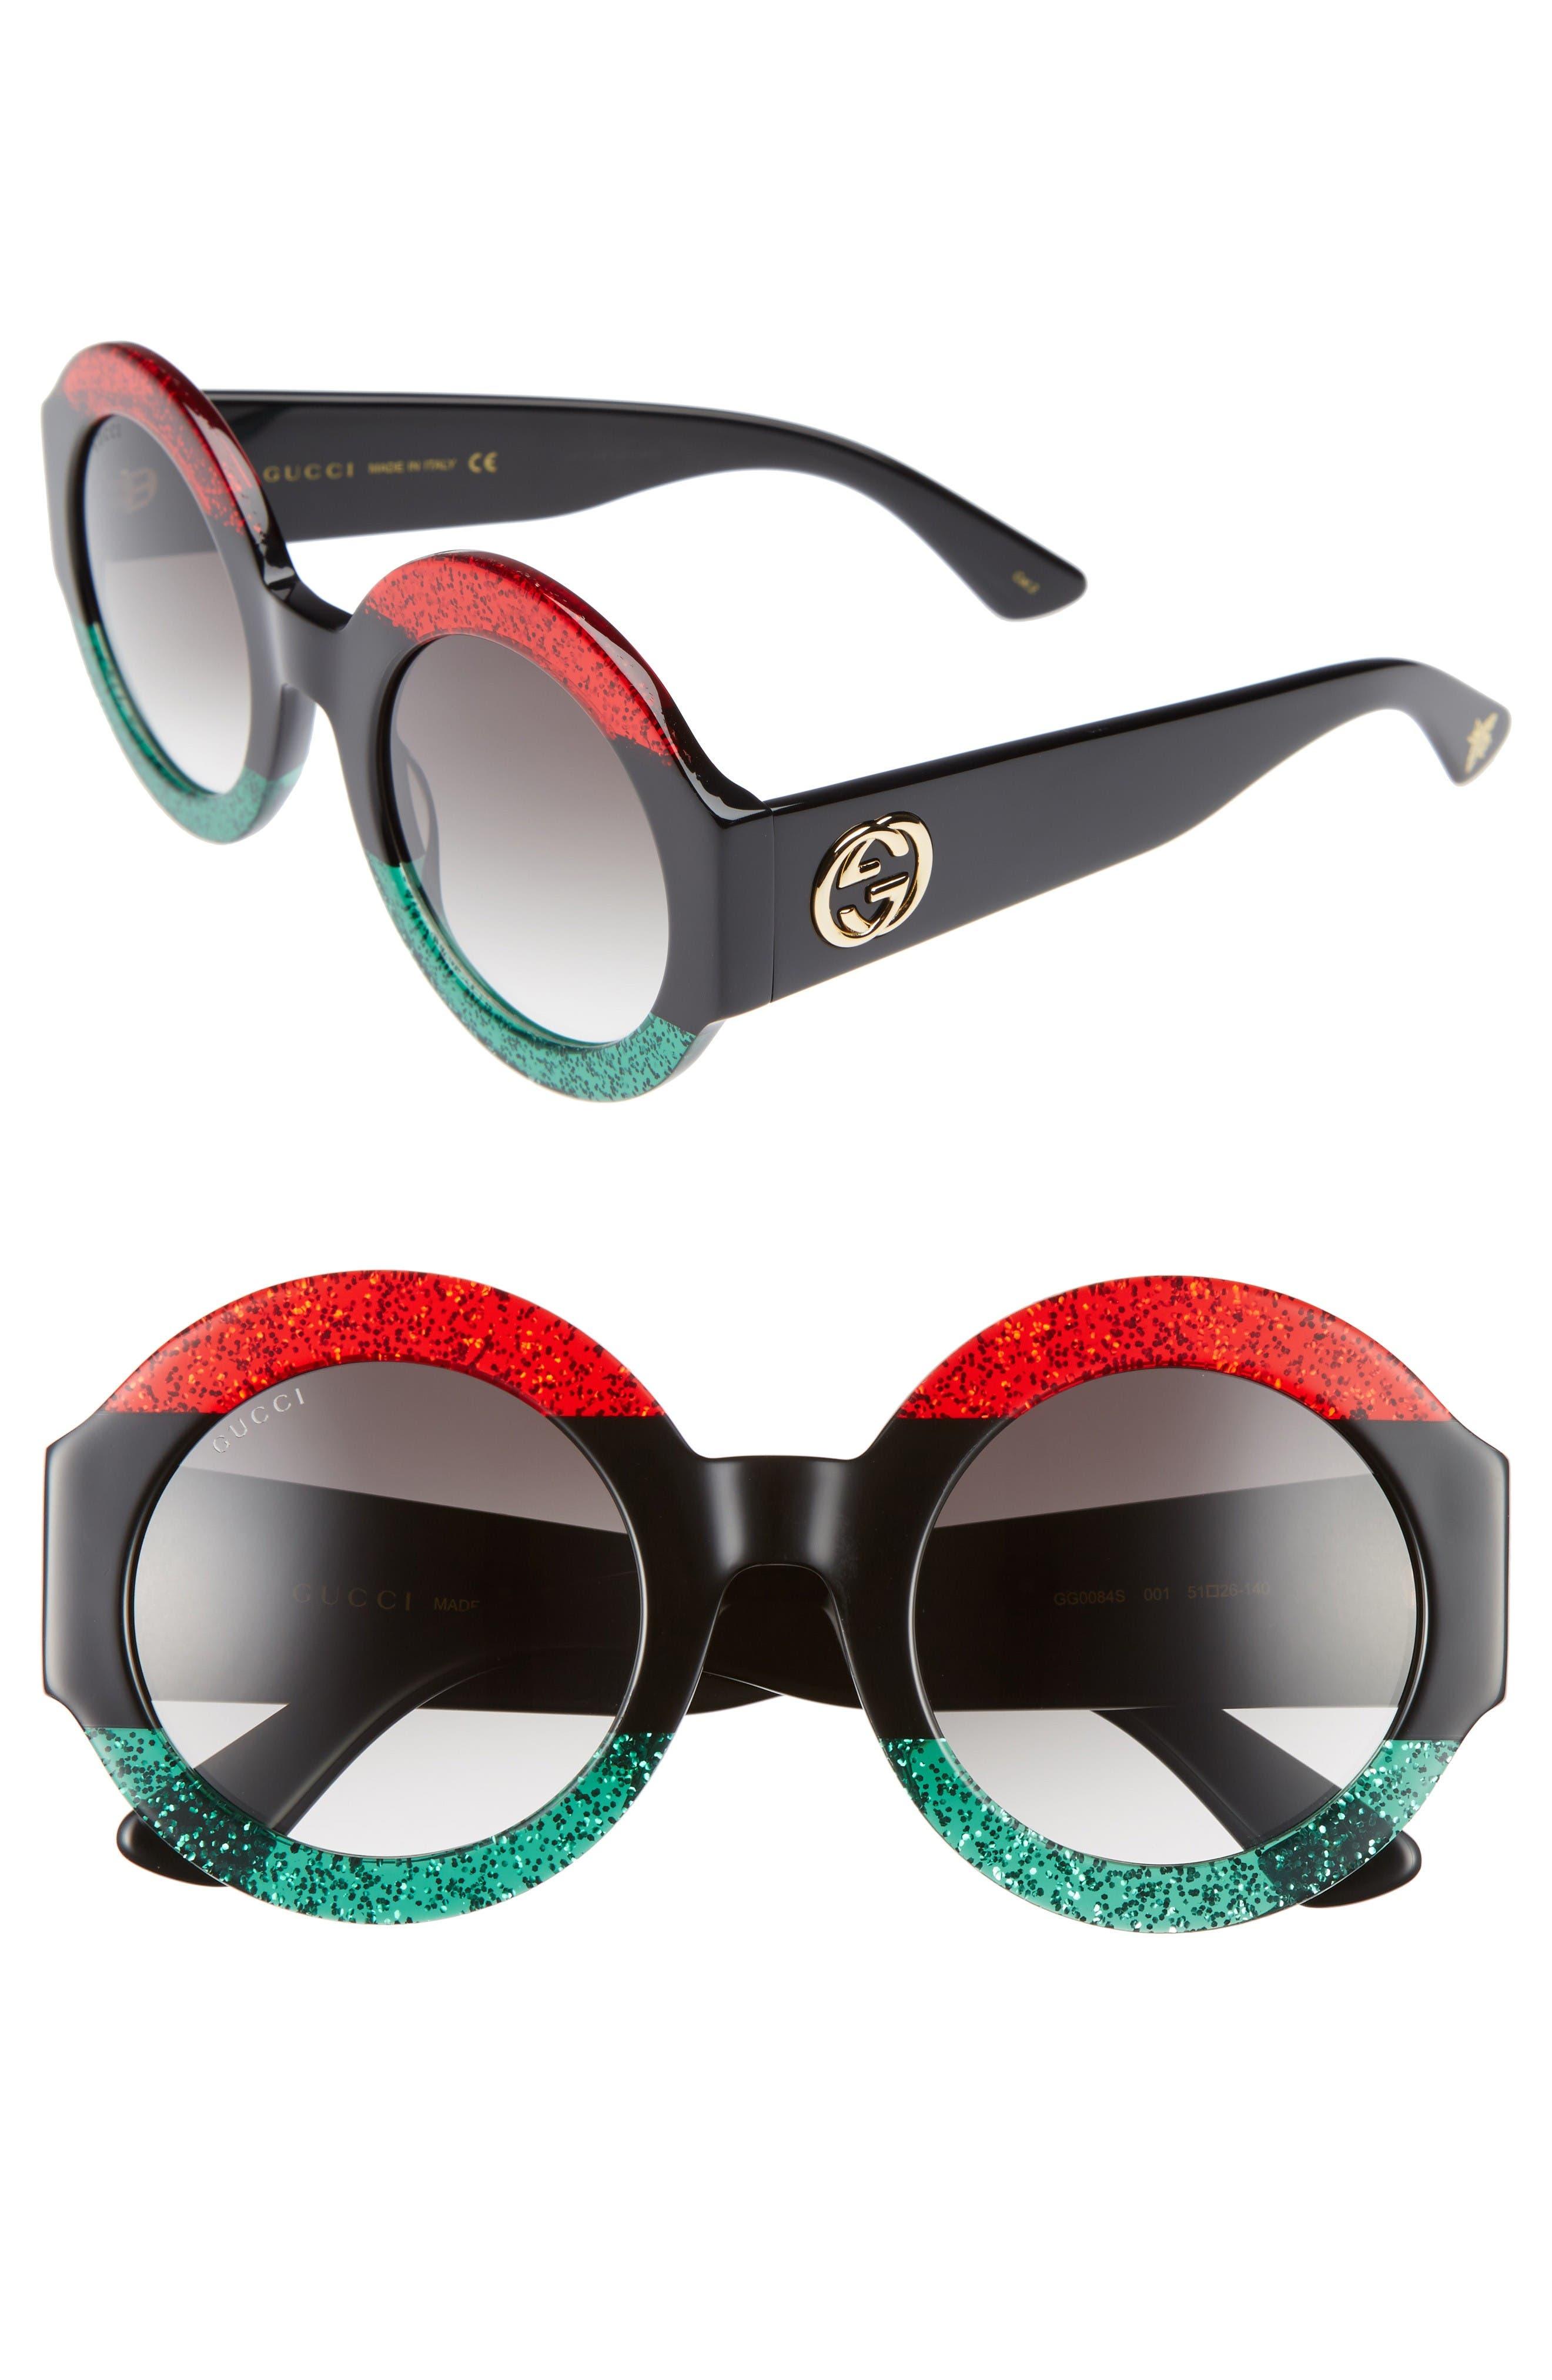 Main Image - Gucci 51mm Round Sunglasses